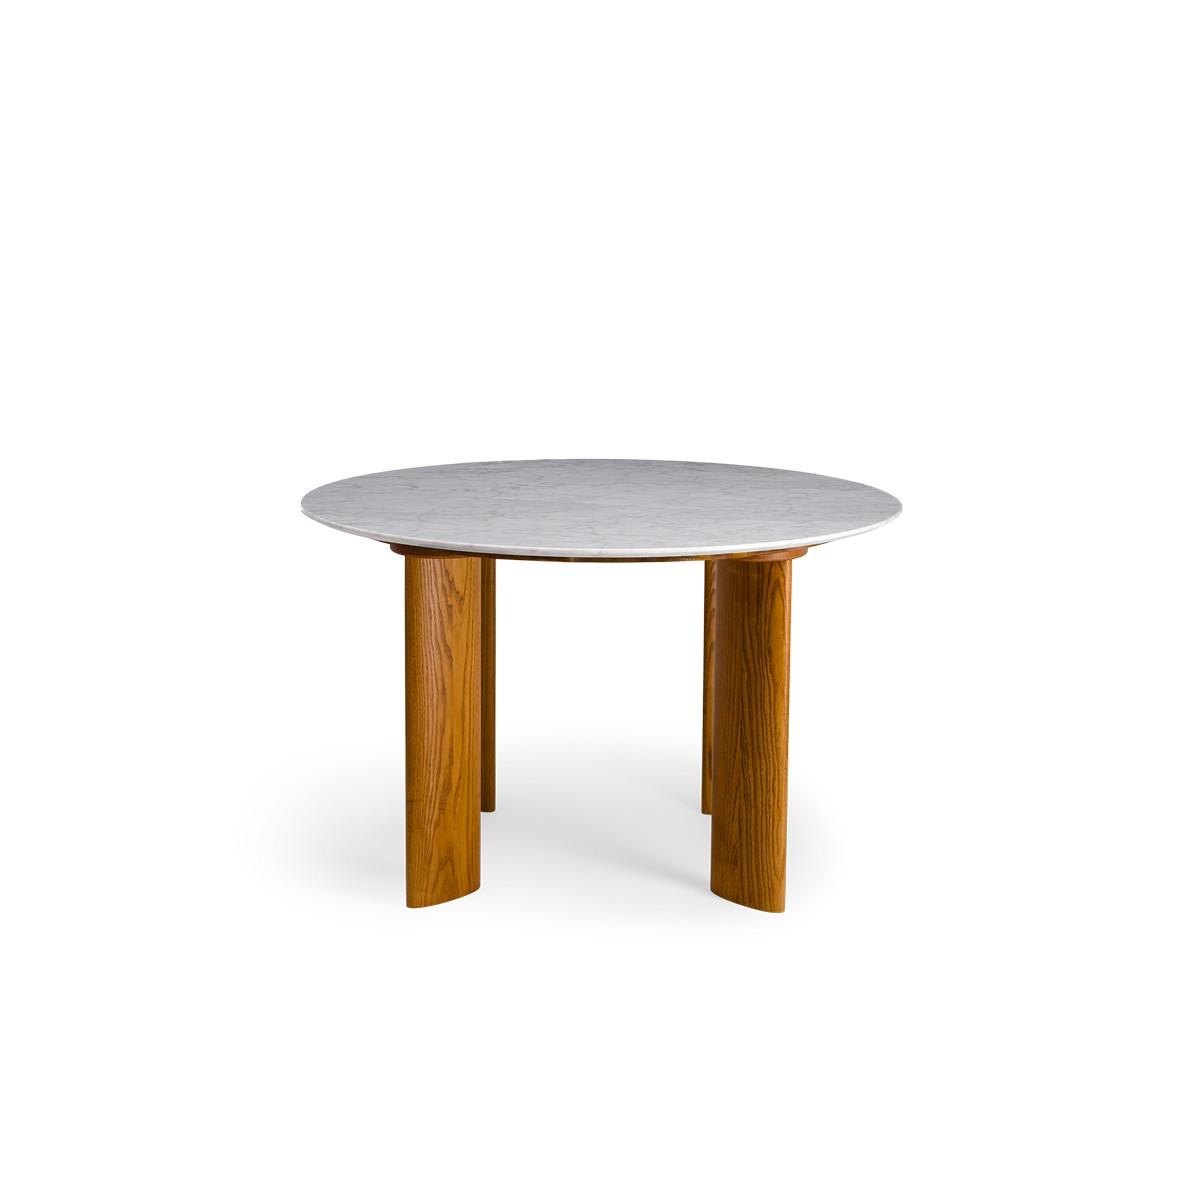 Carlotta Alta Dining Table White Marble and Iroko Finish Legs - 4 Seats